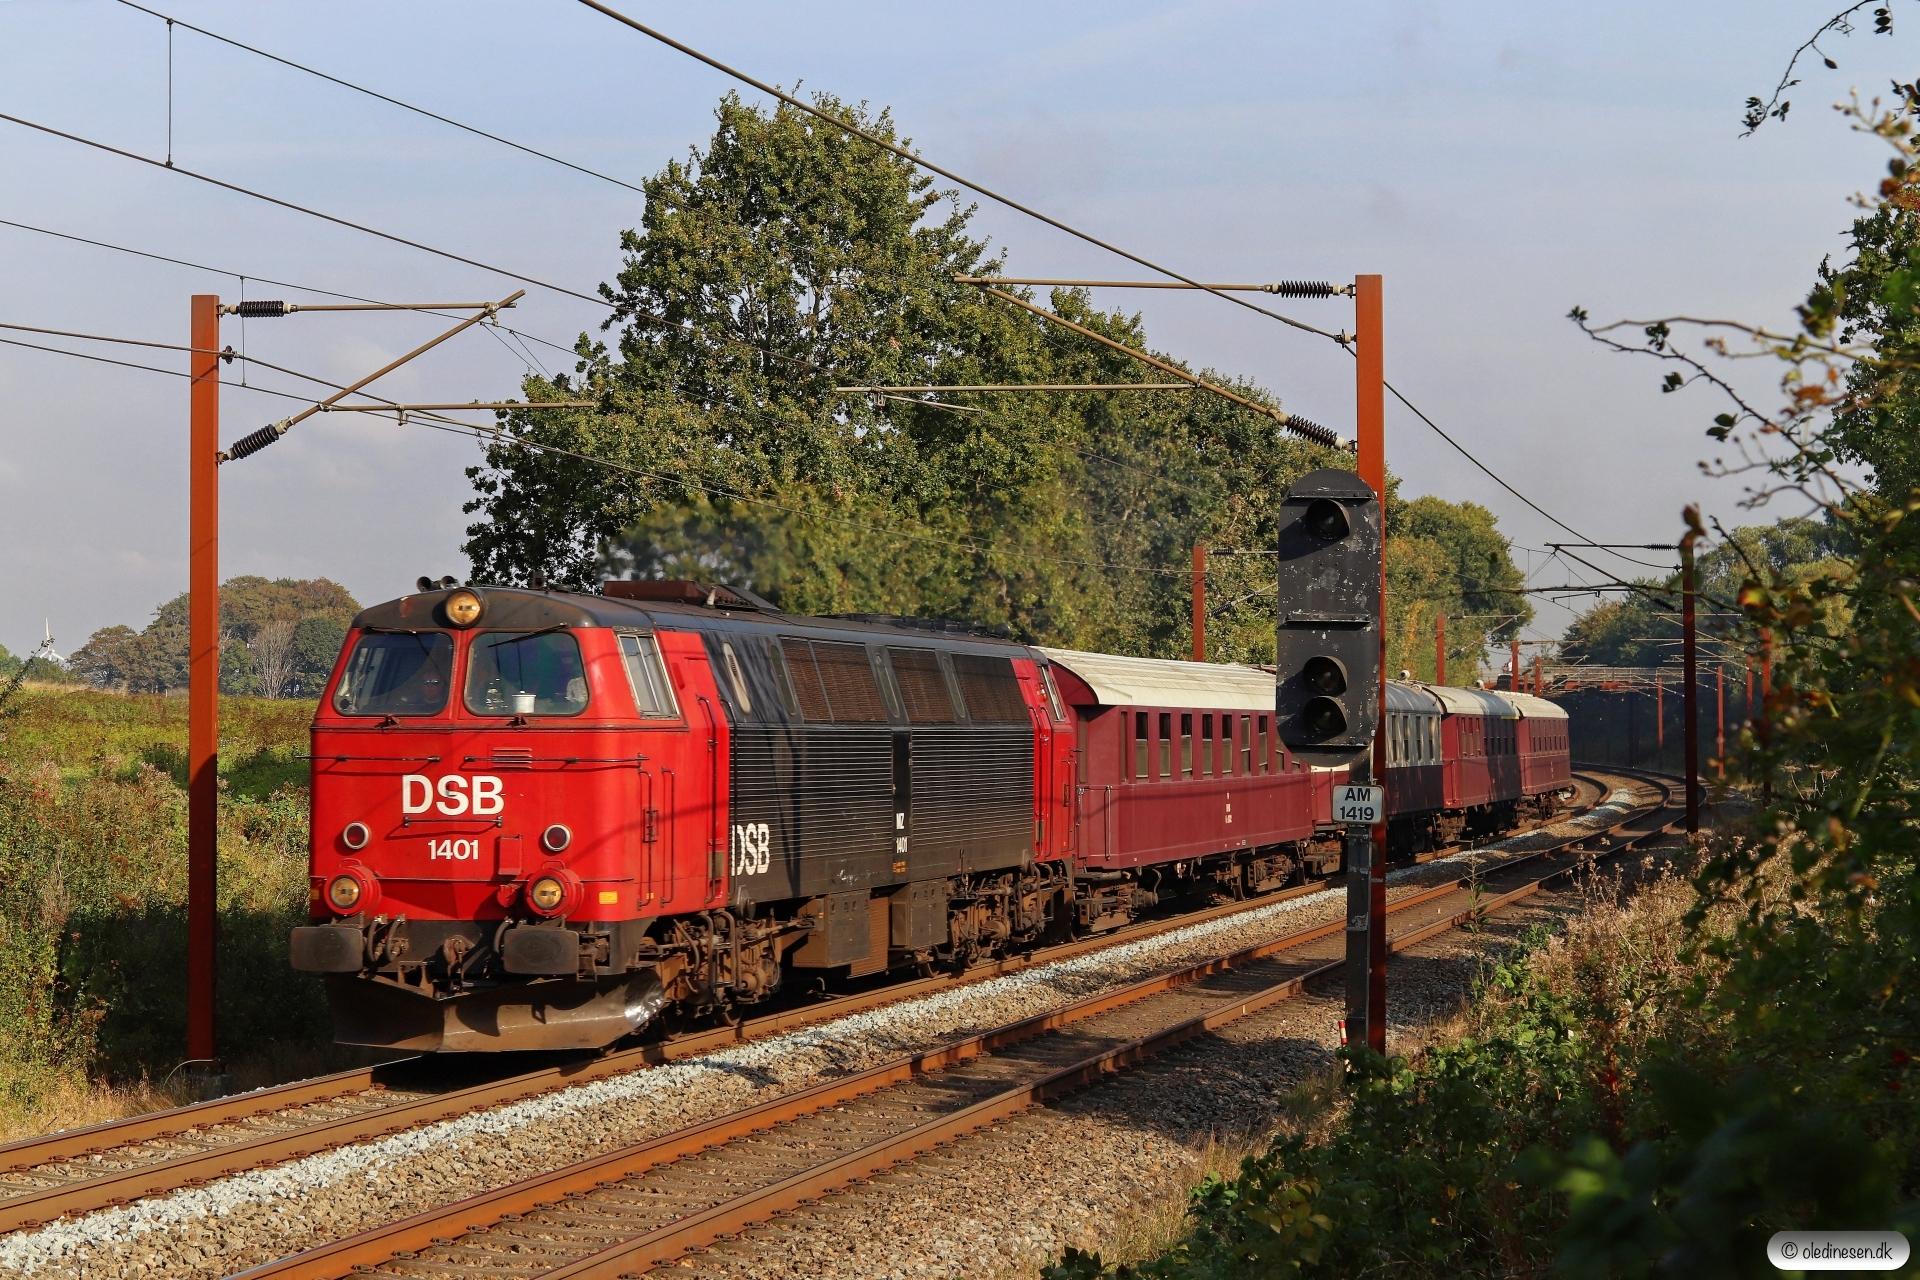 DSB MZ 1401+CC+BU+AX+AC som VP 8303 Od-Es. Km 173,2 Kh (Holmstrup-Tommerup) 27.09.2020.